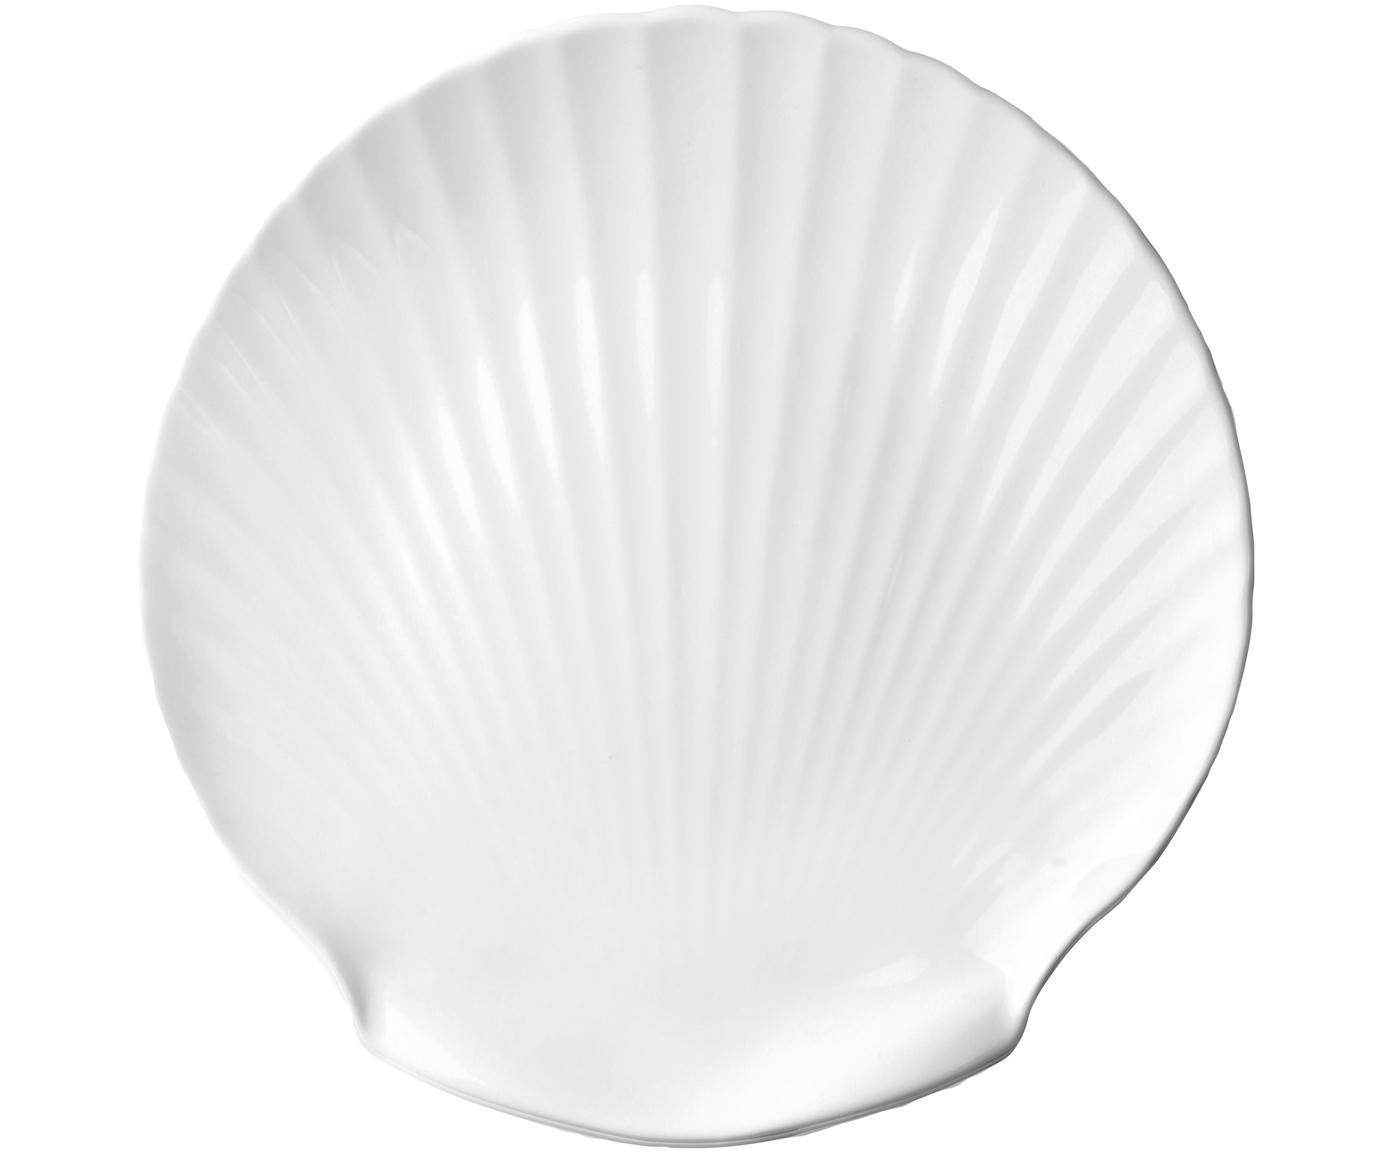 Piatto da portata Fine Bone China Shell, Porcellana Fine Bone China, Bianco, Ø 27 cm